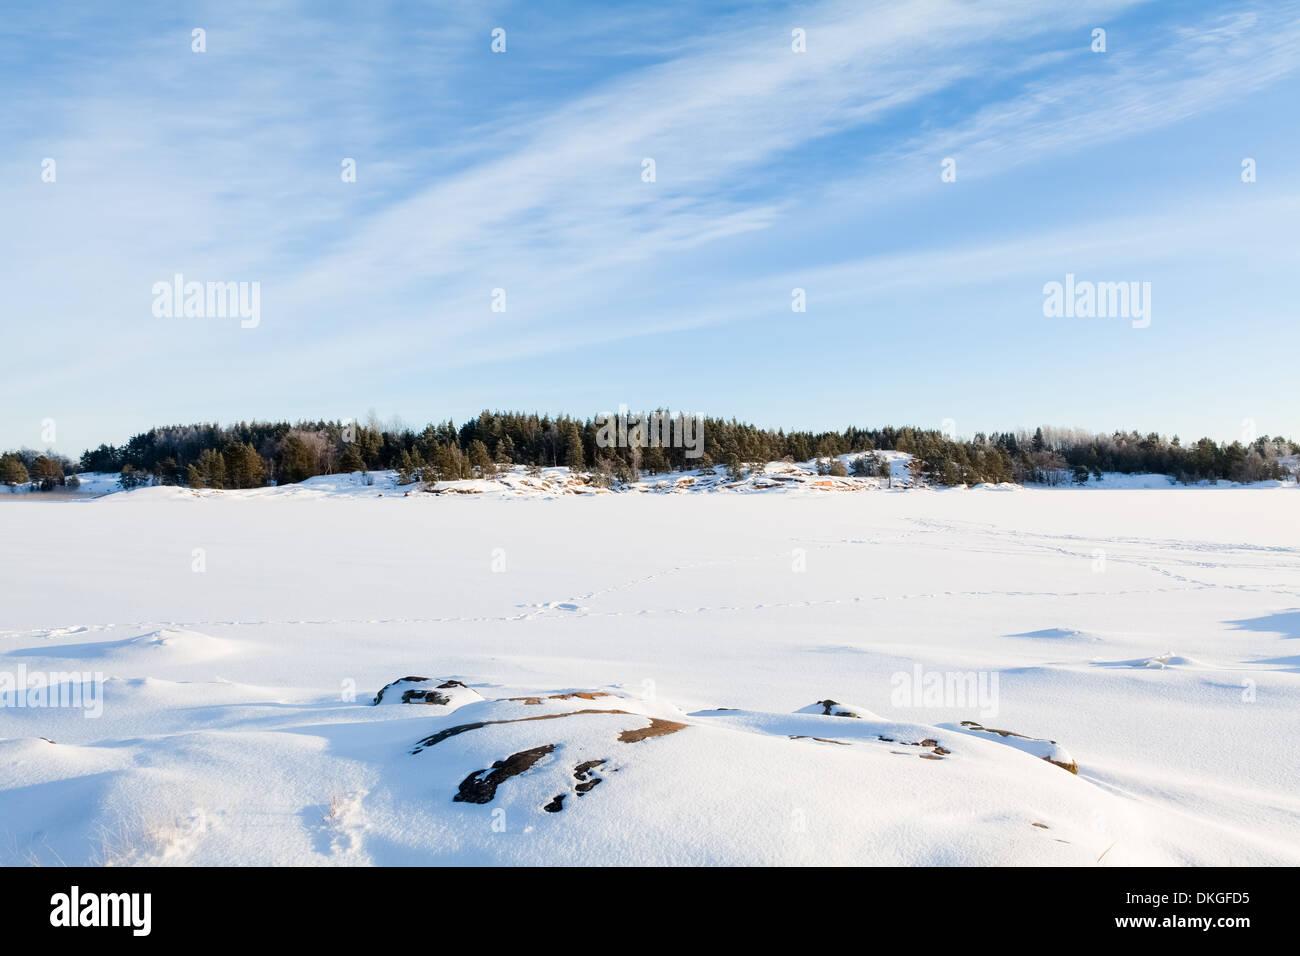 Baltic Sea at winter, Finland Stock Photo